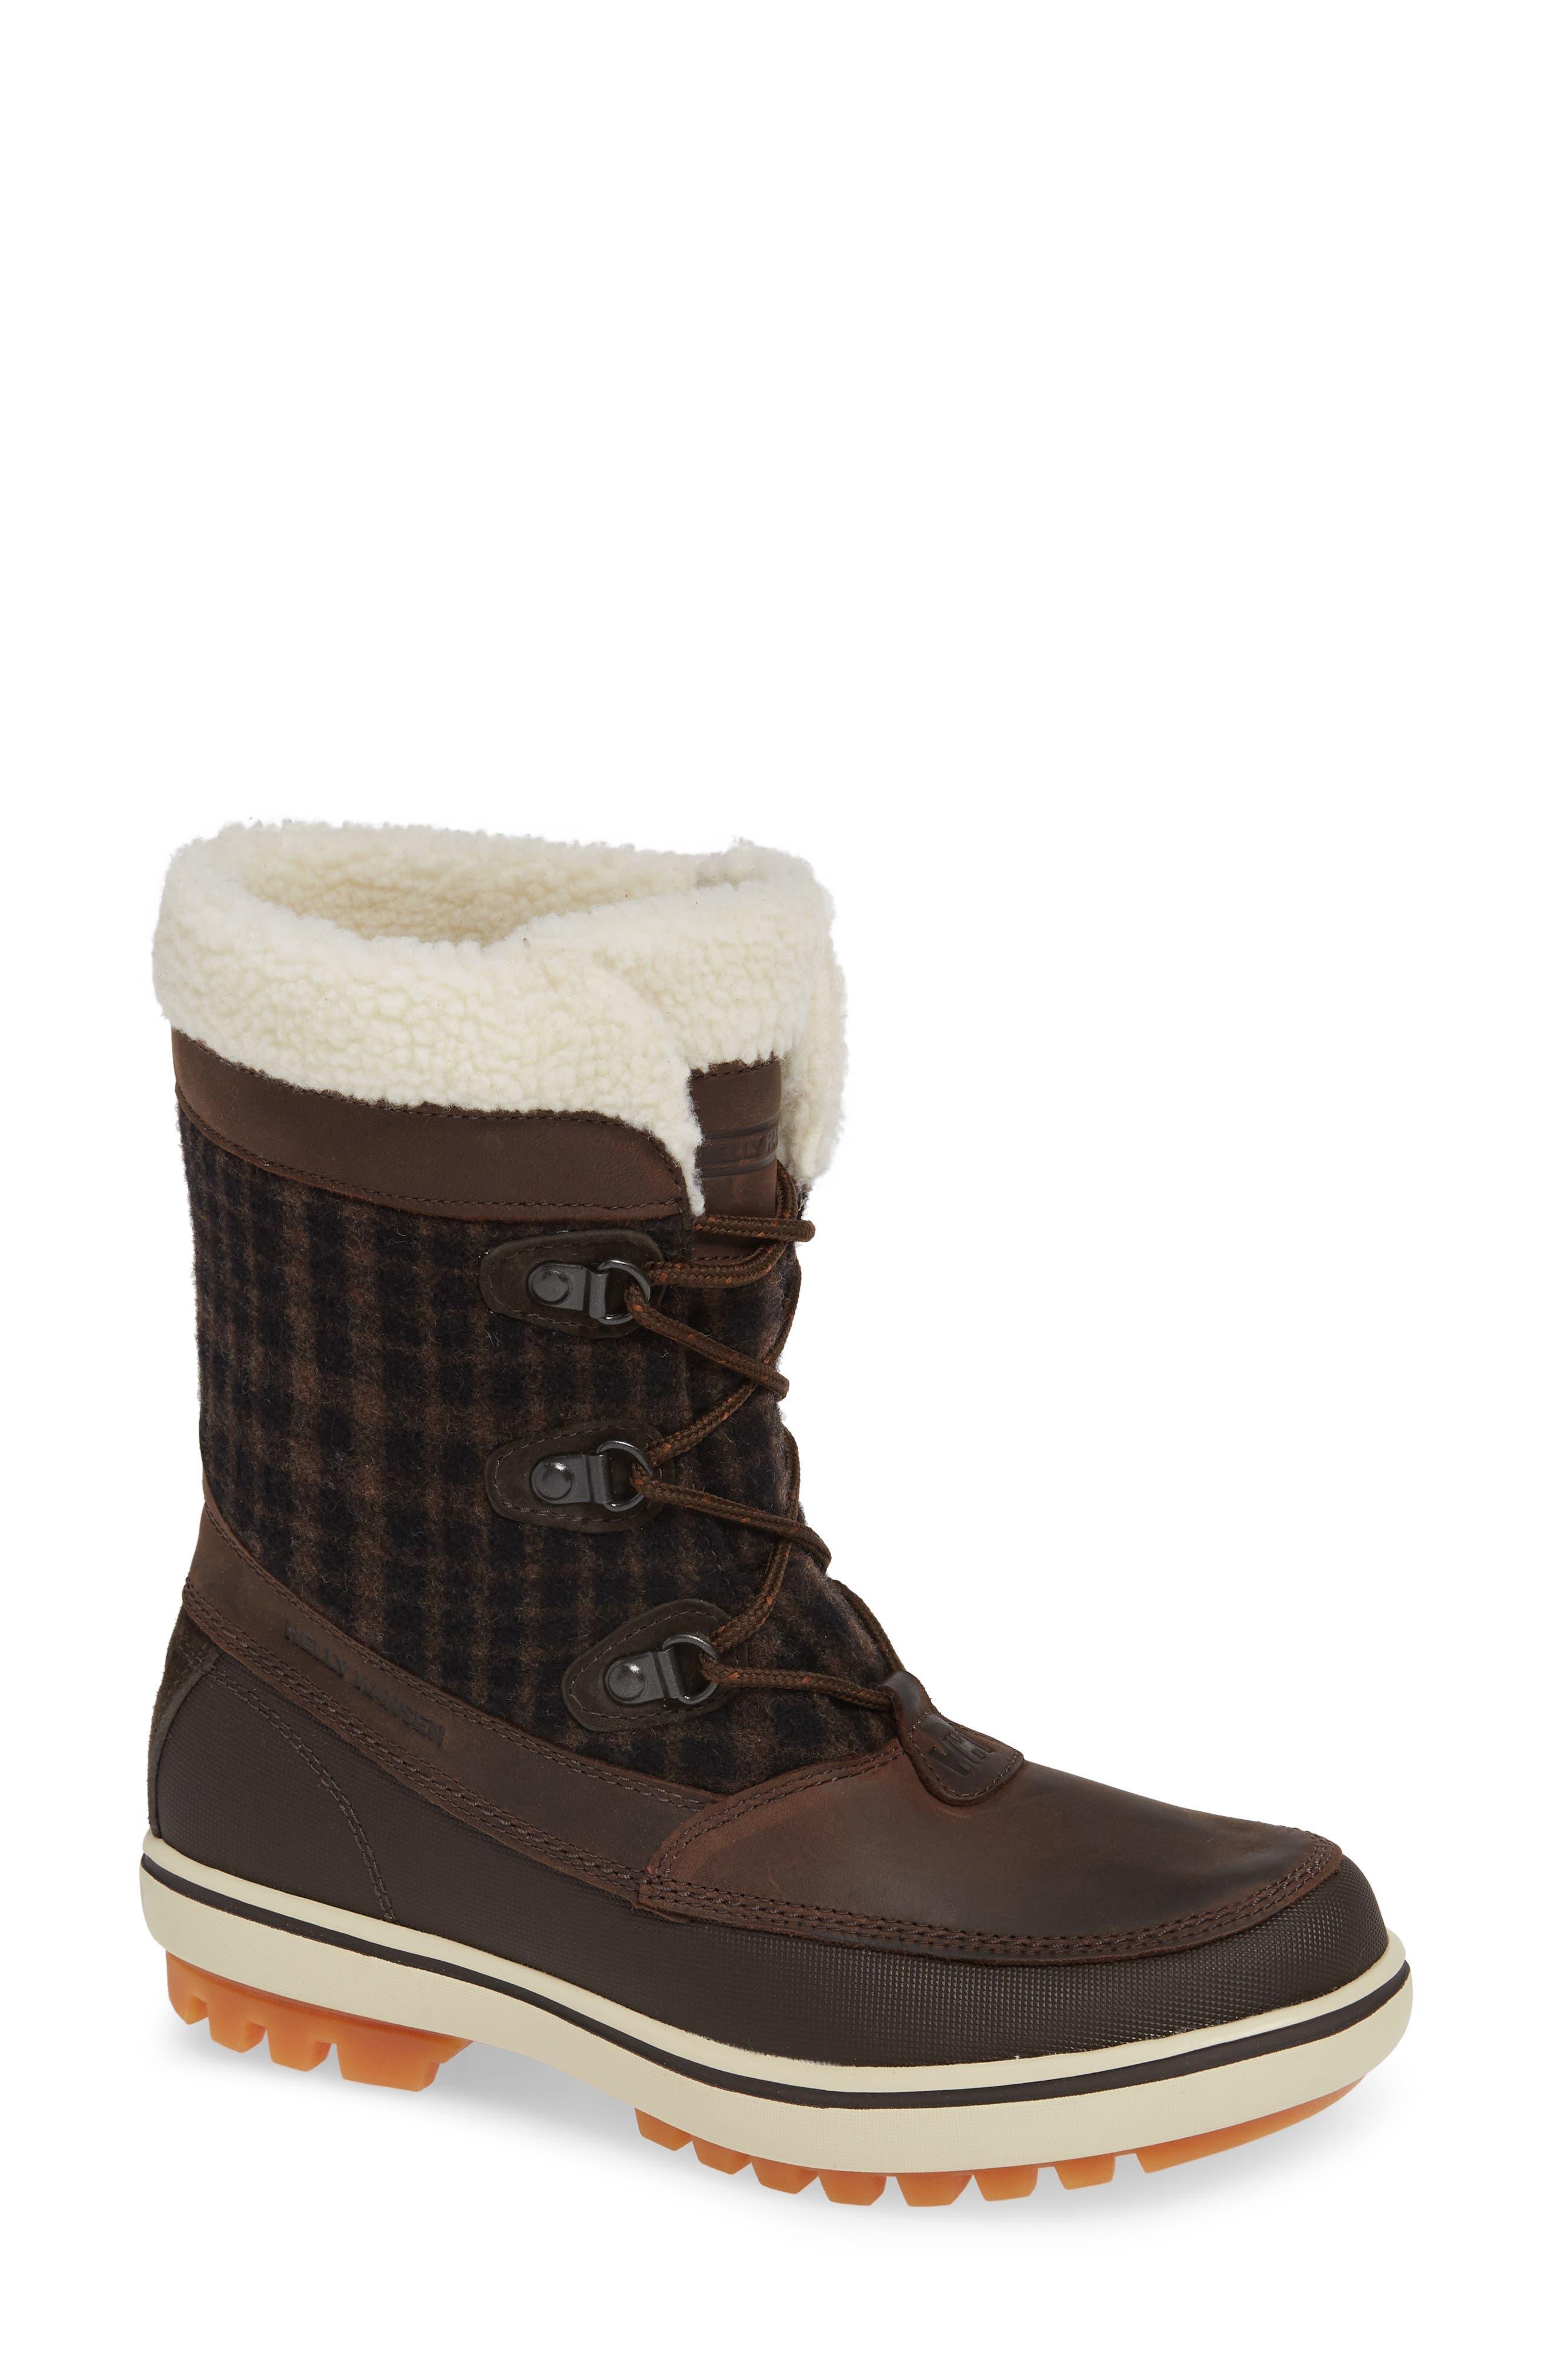 Georgina Snow Waterproof Boot,                             Main thumbnail 1, color,                             CLAY/ COFFEE BEAN